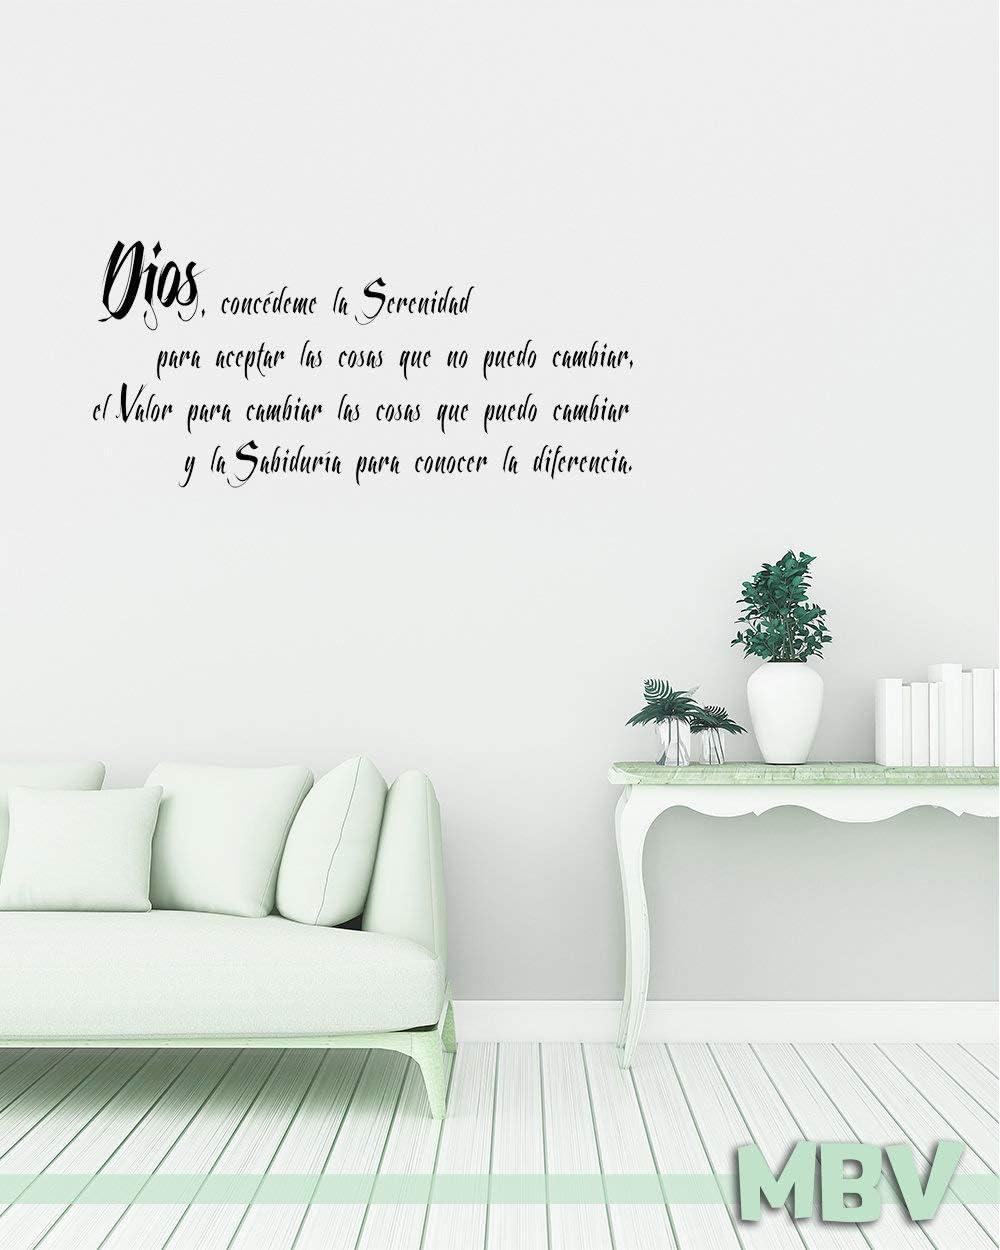 Spanish Serenity Prayer Wall Quote - Wall Decal - Oracion de la serenidad Vinyl Sticker Lettering - Spanish Wall Saying - Home Decor Dios Made in USA